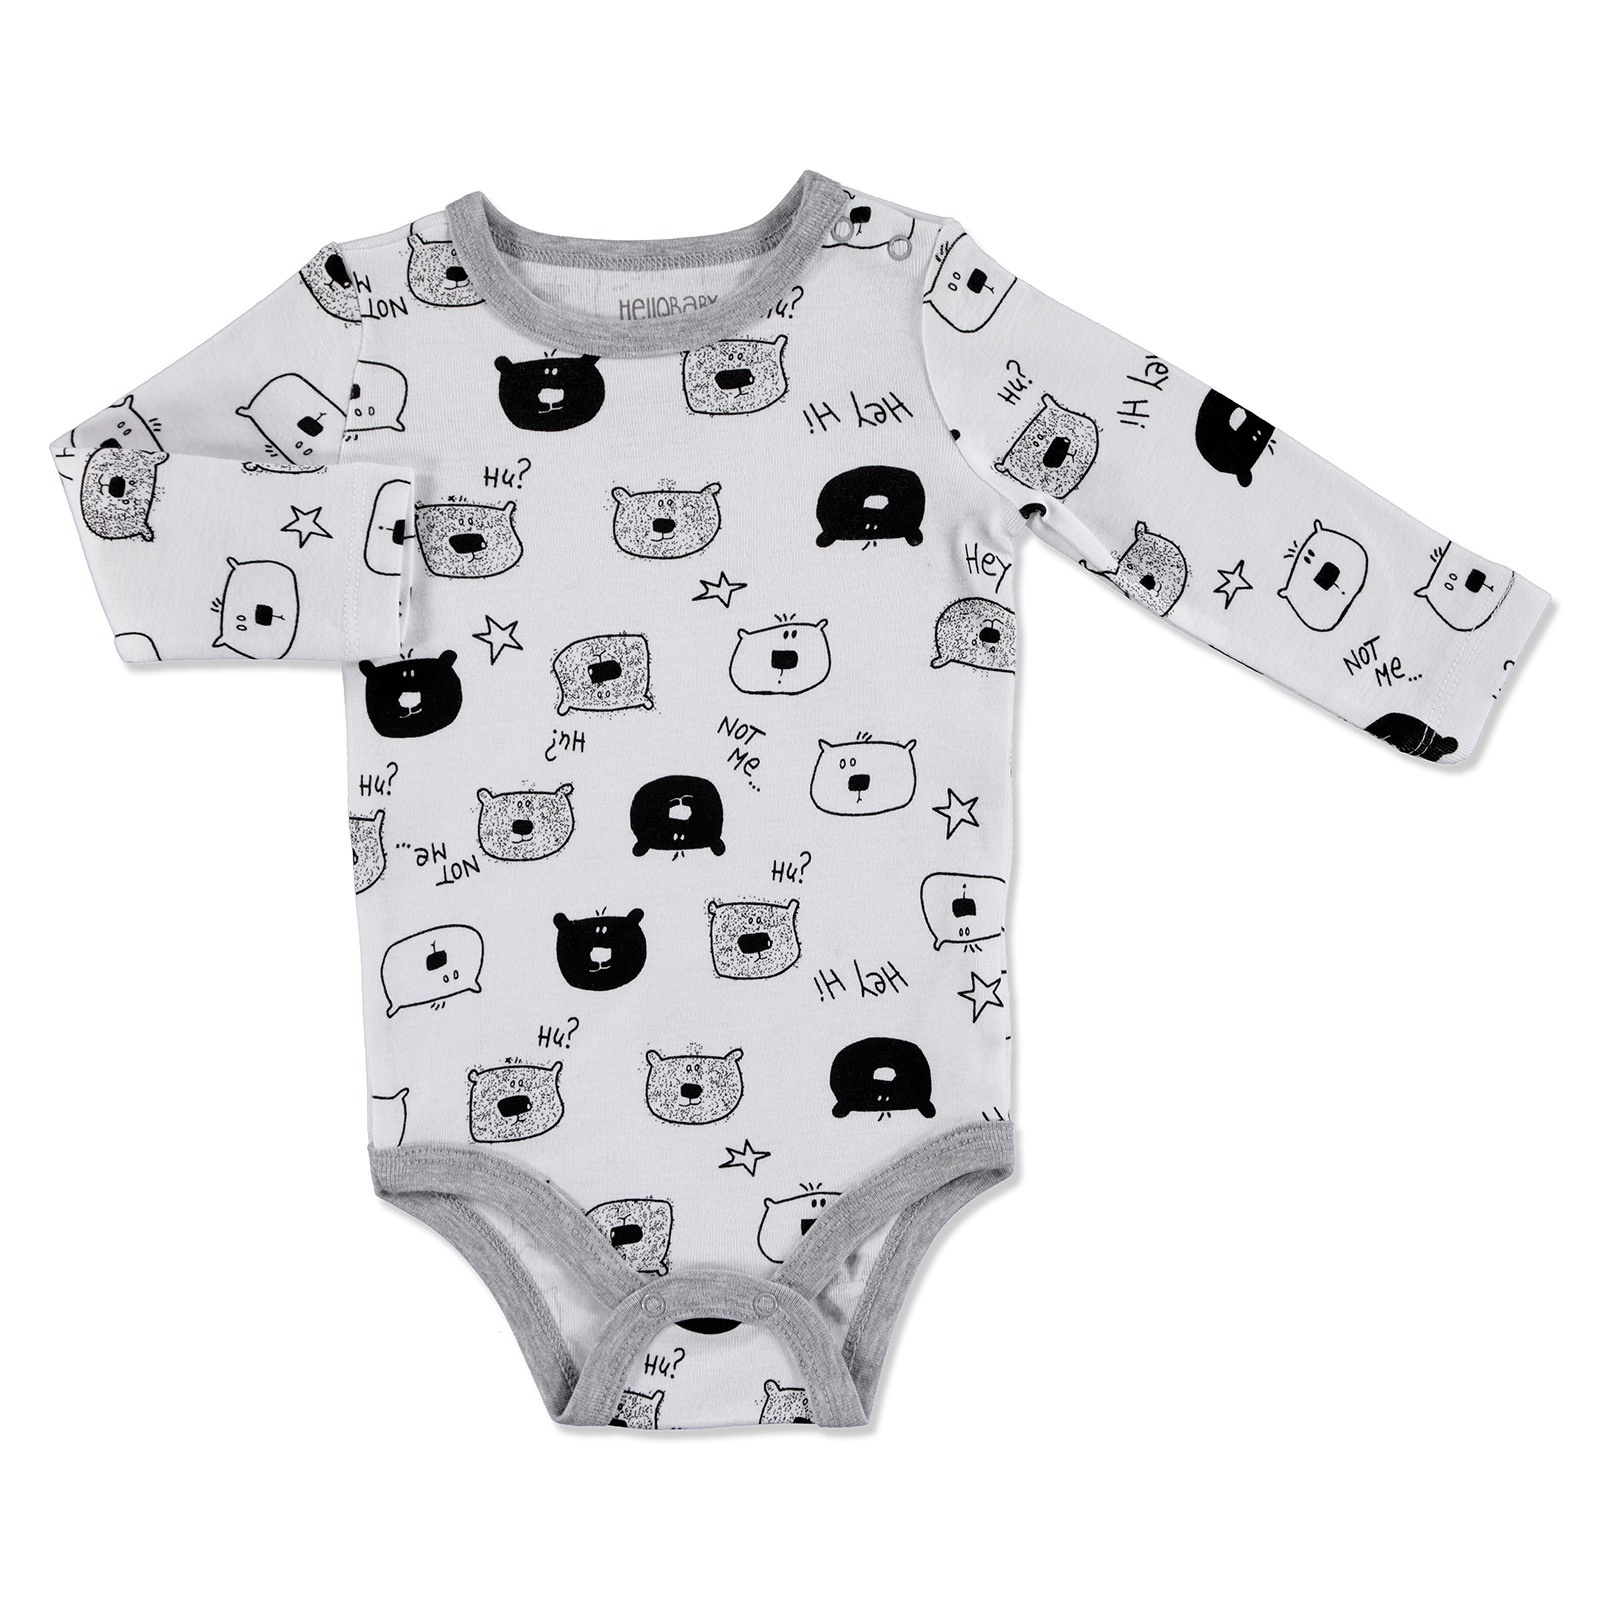 Ebebek HelloBaby Baby Printed Long Sleeve Bodysuit